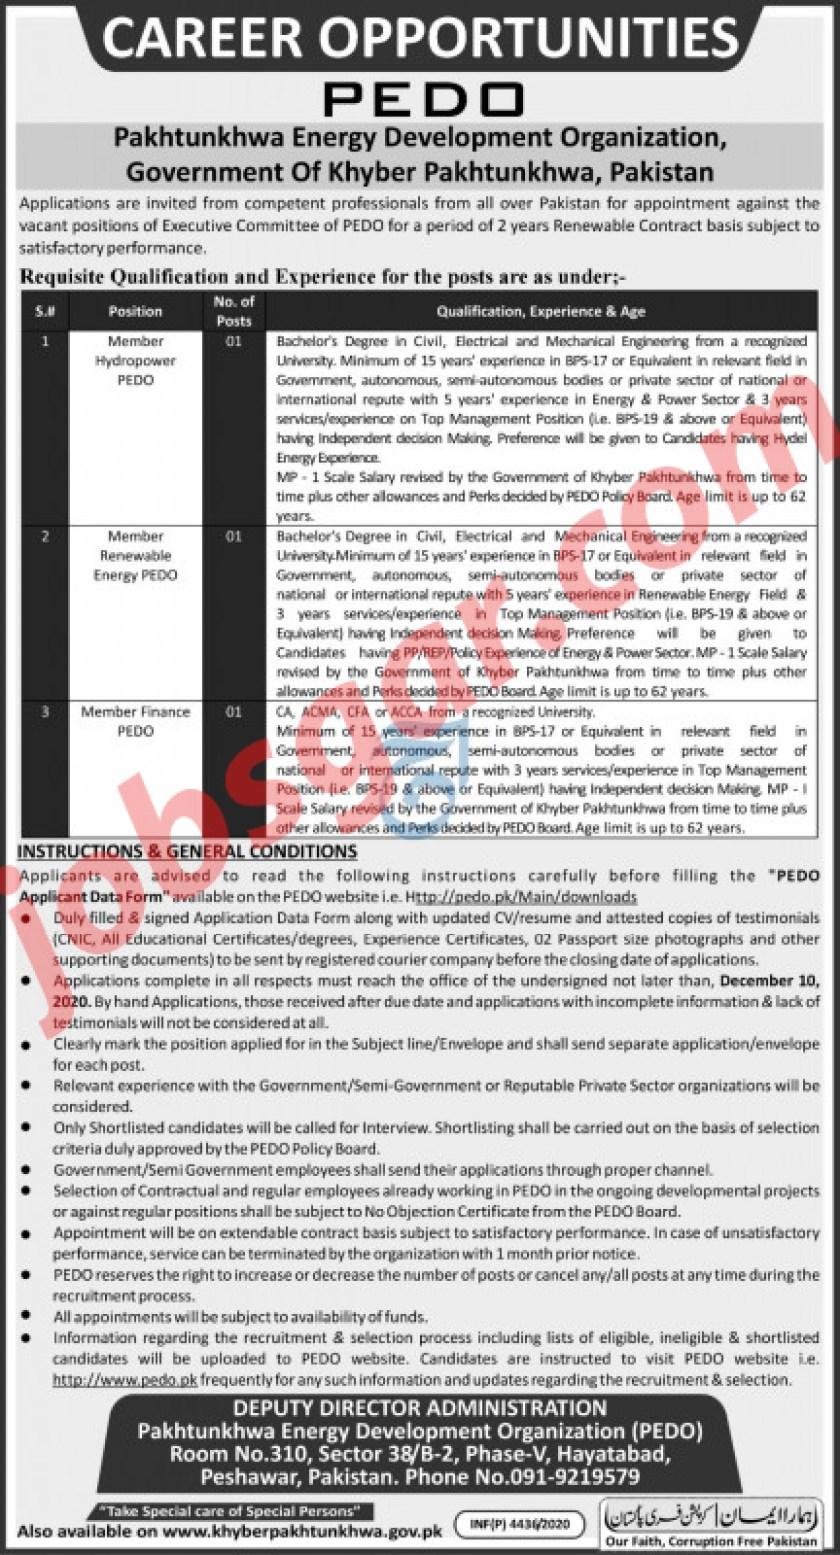 Pakhtunkhwa Energy Development Organization PEDO Jobs Nov 2020